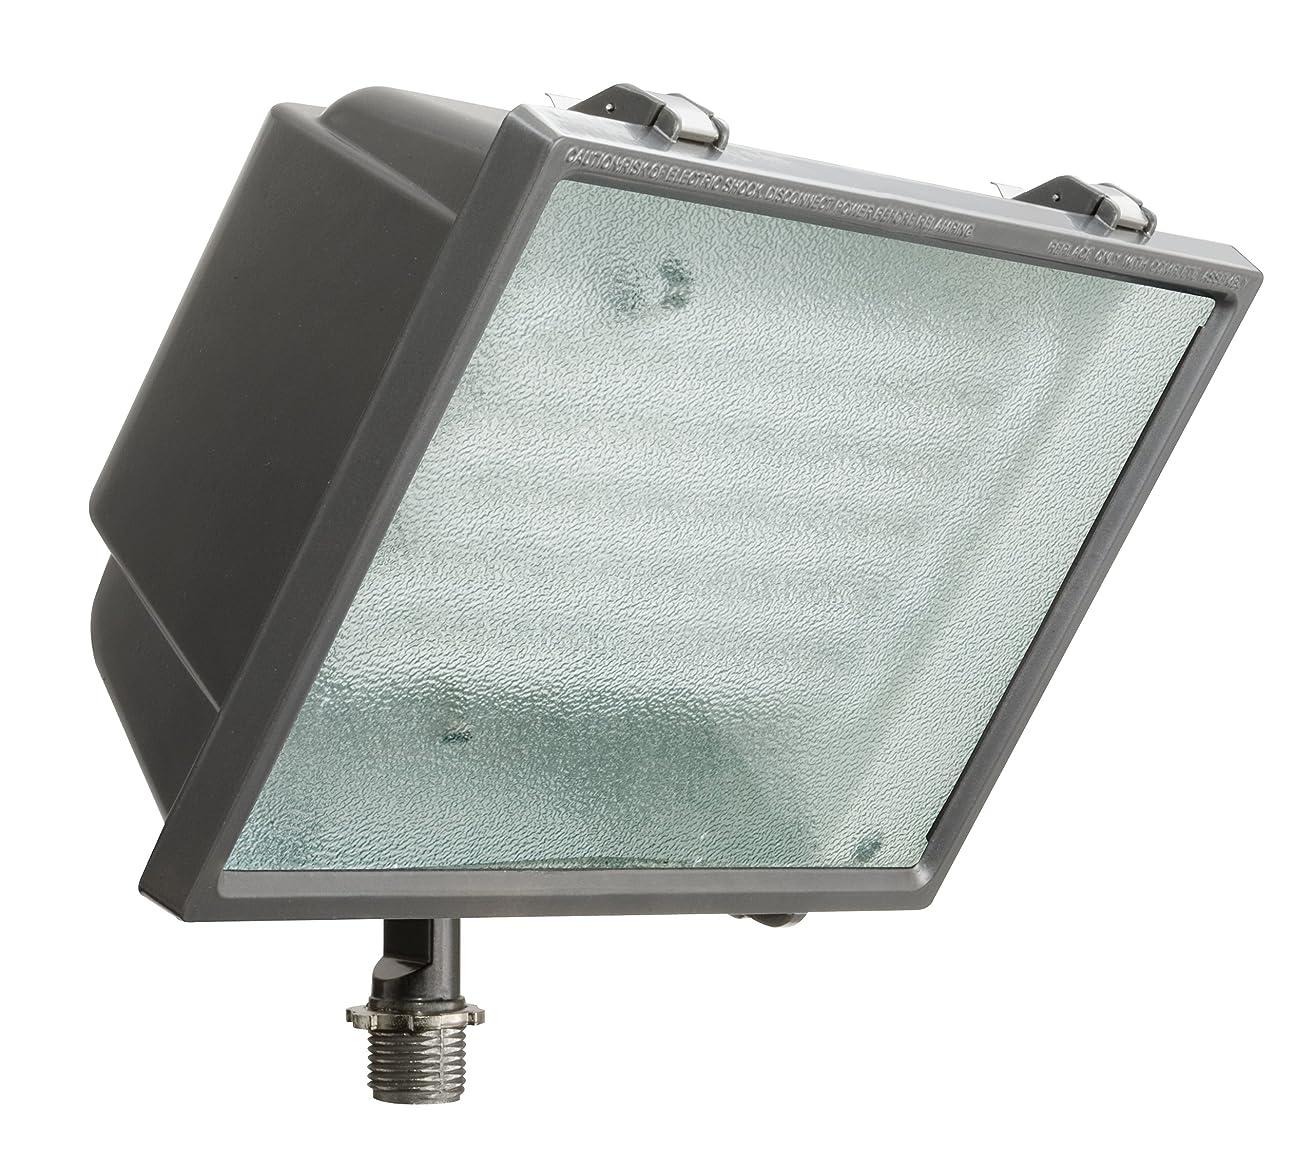 Lithonia Lighting OFL2 65F 120 LP BZ M4 Standard Flood Light with 65-Watt 6500K Triple Tube Compact Fluorescent Lamp, Black Bronze